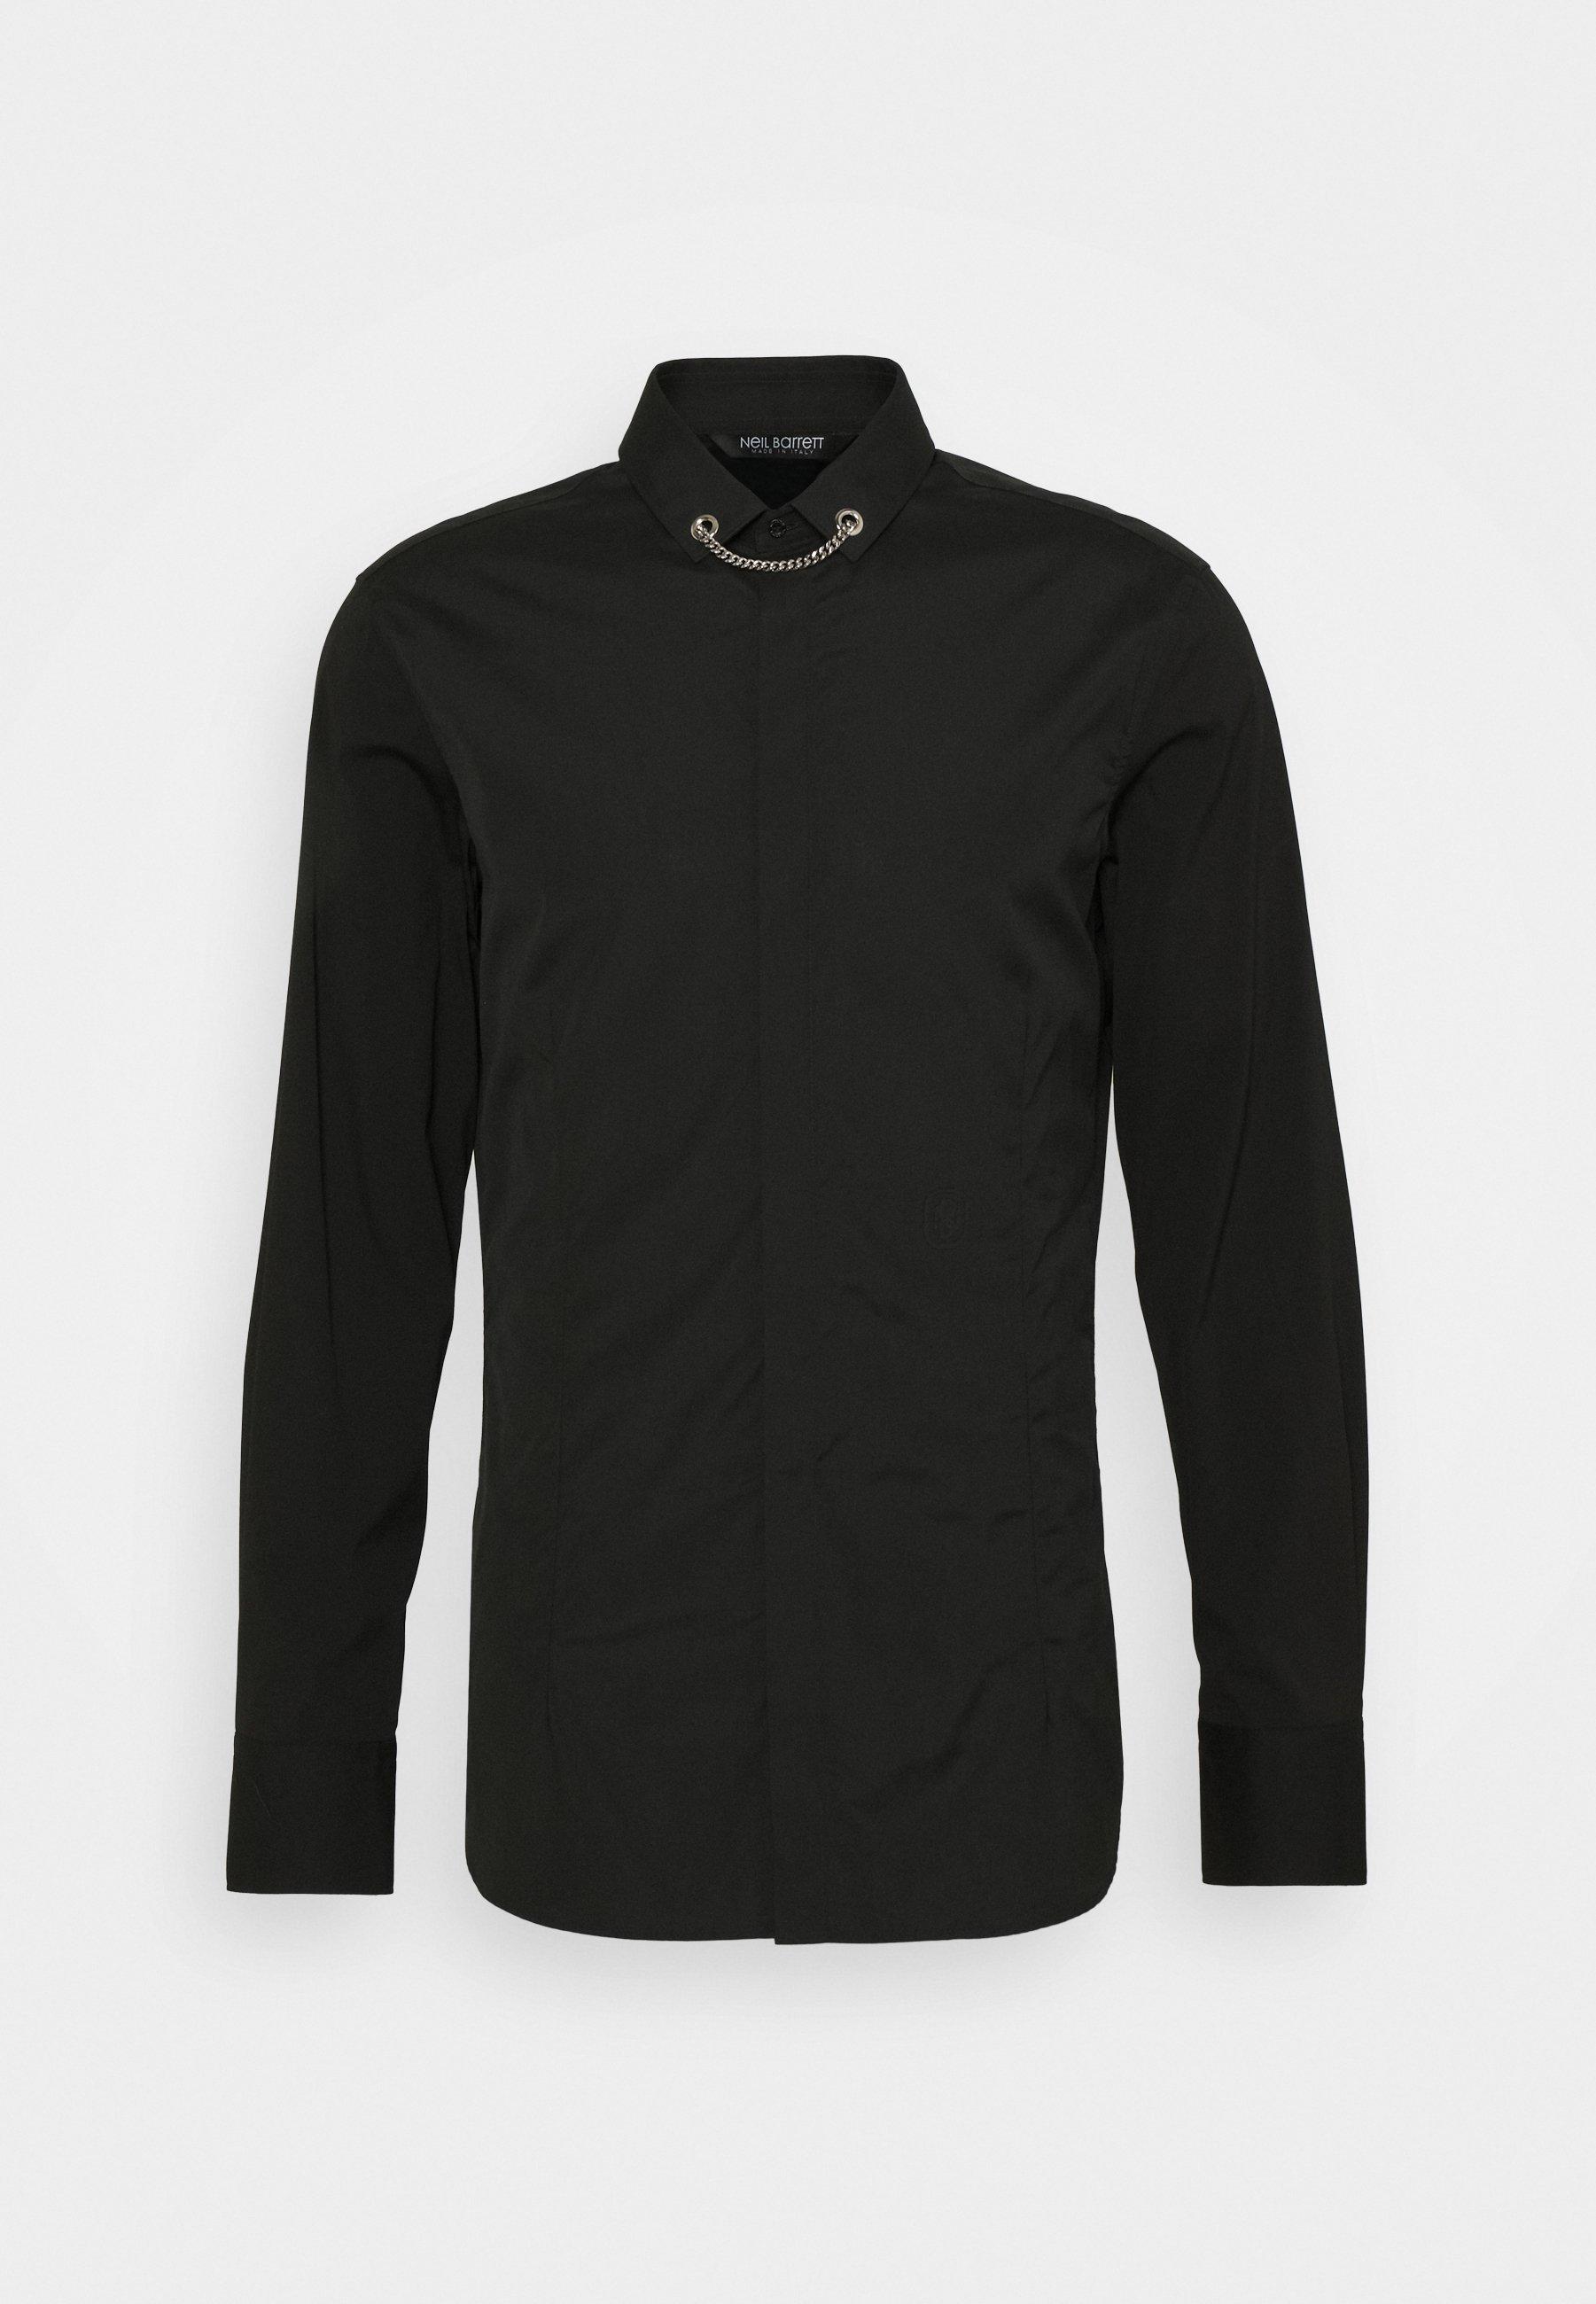 Neil Barrett Tuxedo Flat Necklac - Hemd Black